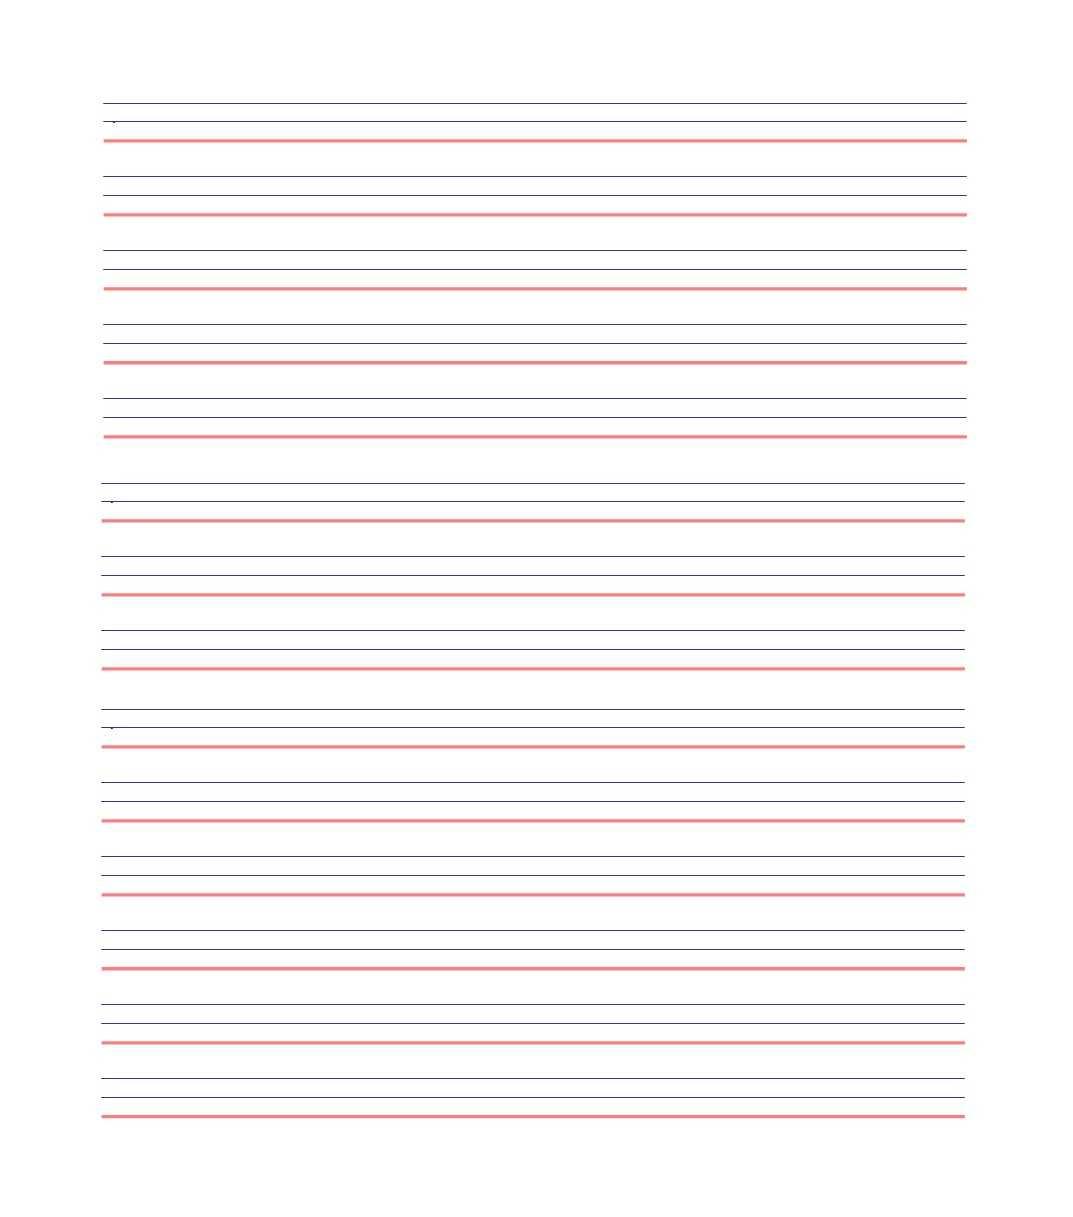 Lined Notebook Paper Template Word – Karan.ald2014 Within Notebook Paper Template For Word 2010